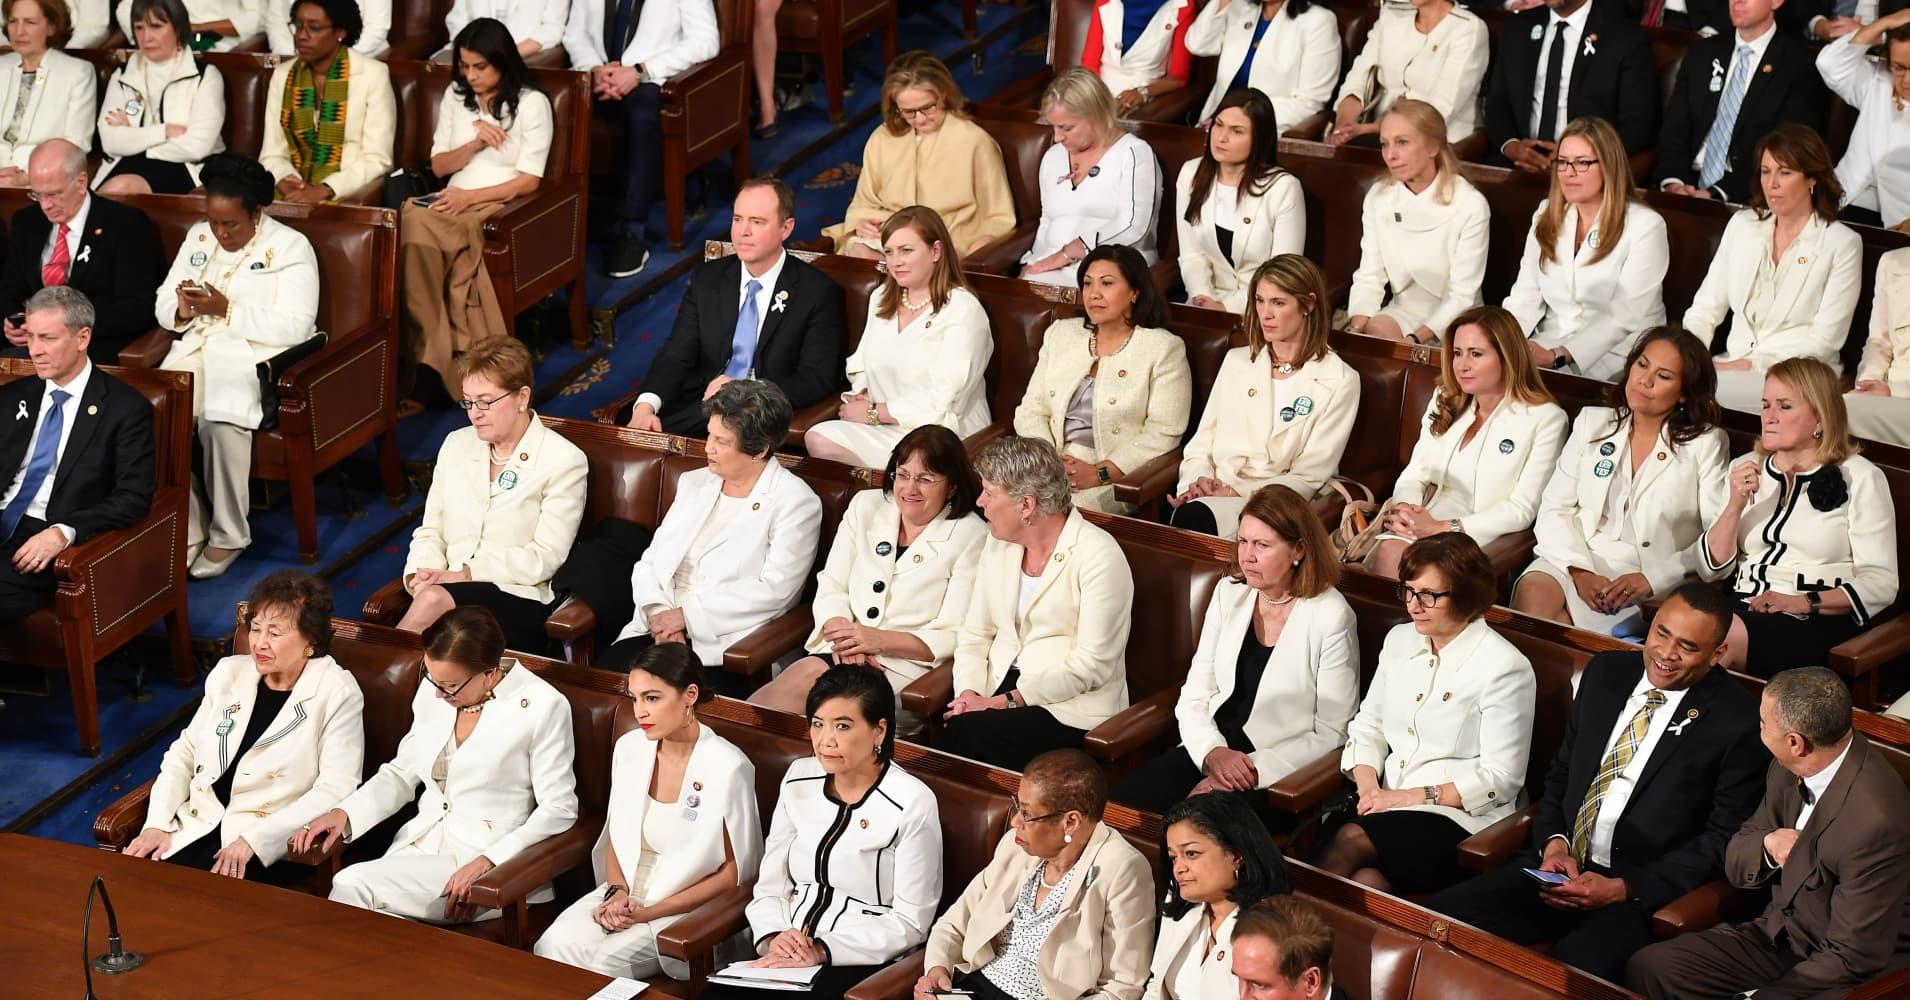 More women held seats on boards last year — but progress has slowed, JP Morgan says